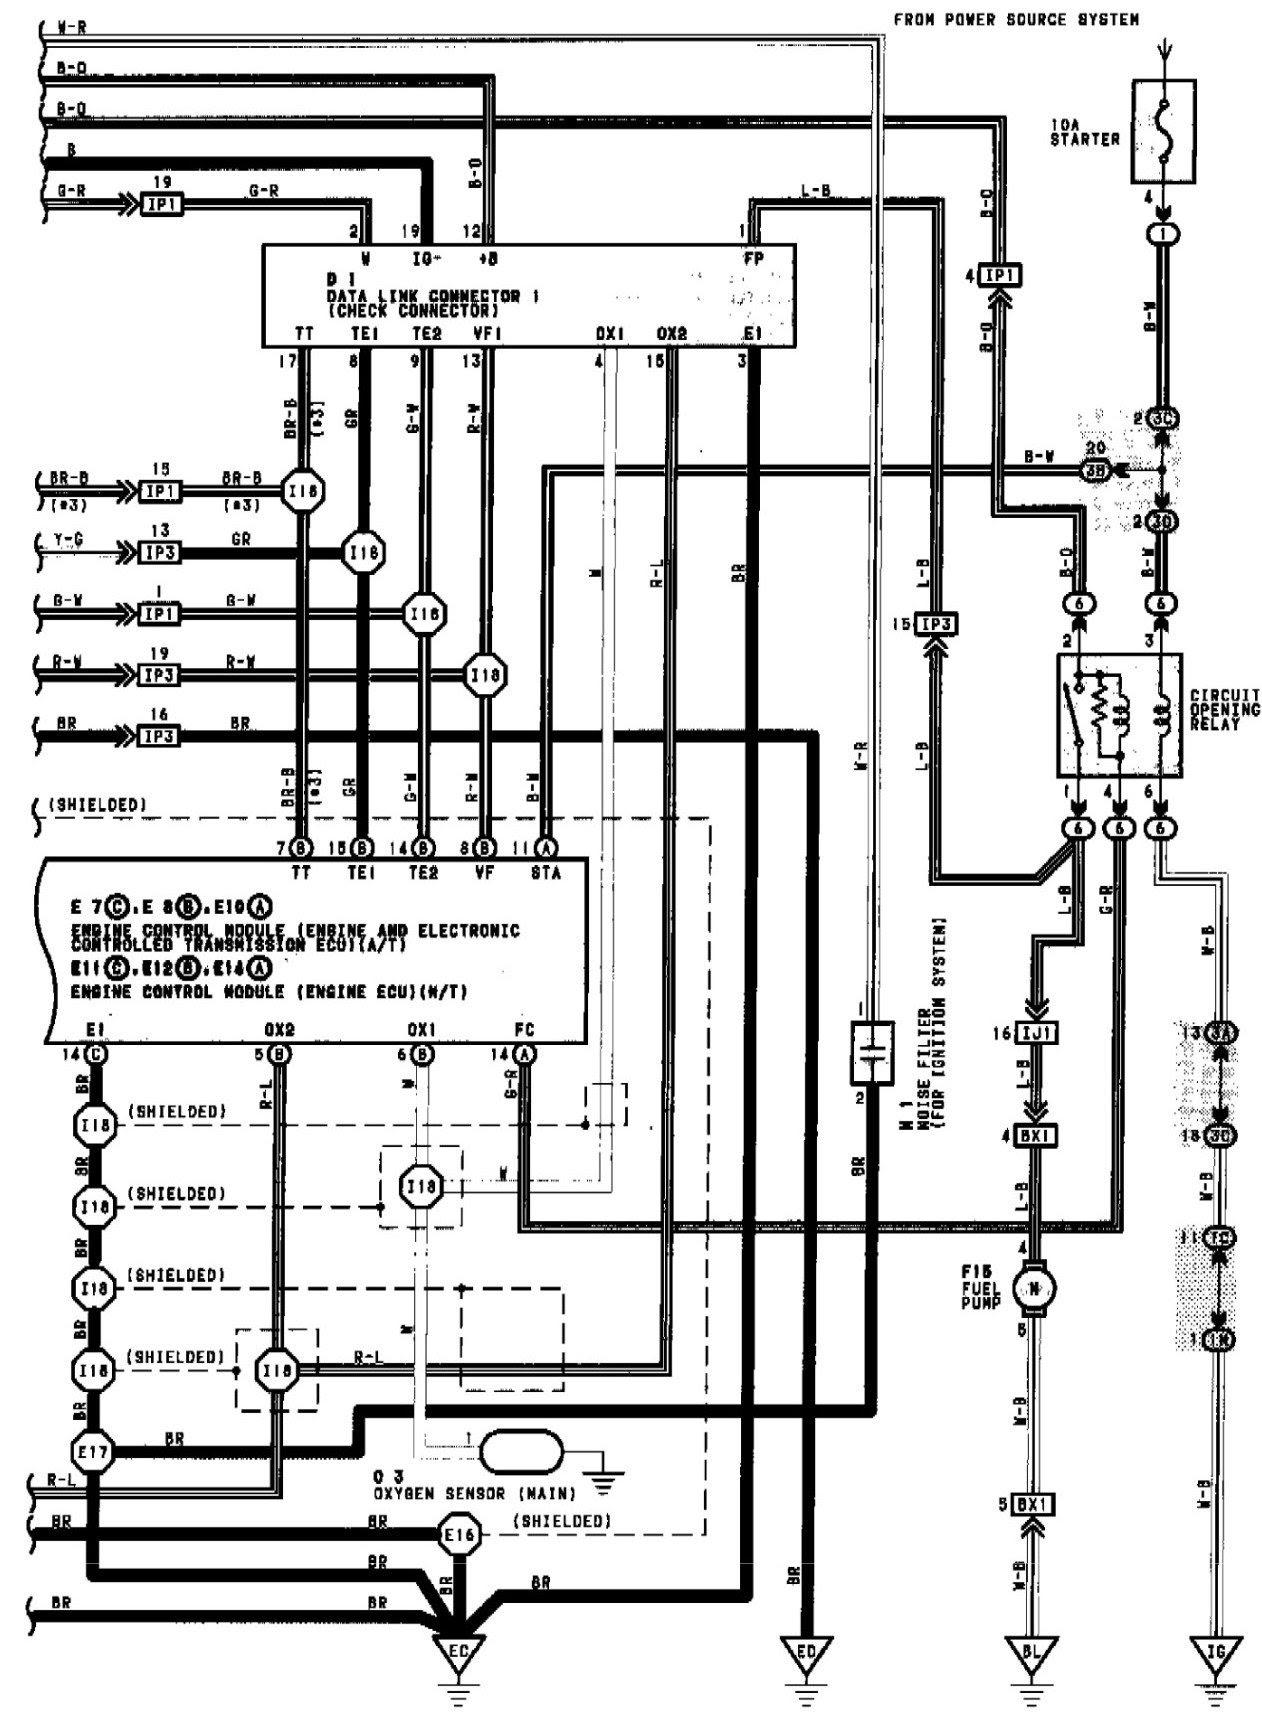 01 Camry Wiring Diagram Wiring Diagram Report1 Report1 Maceratadoc It